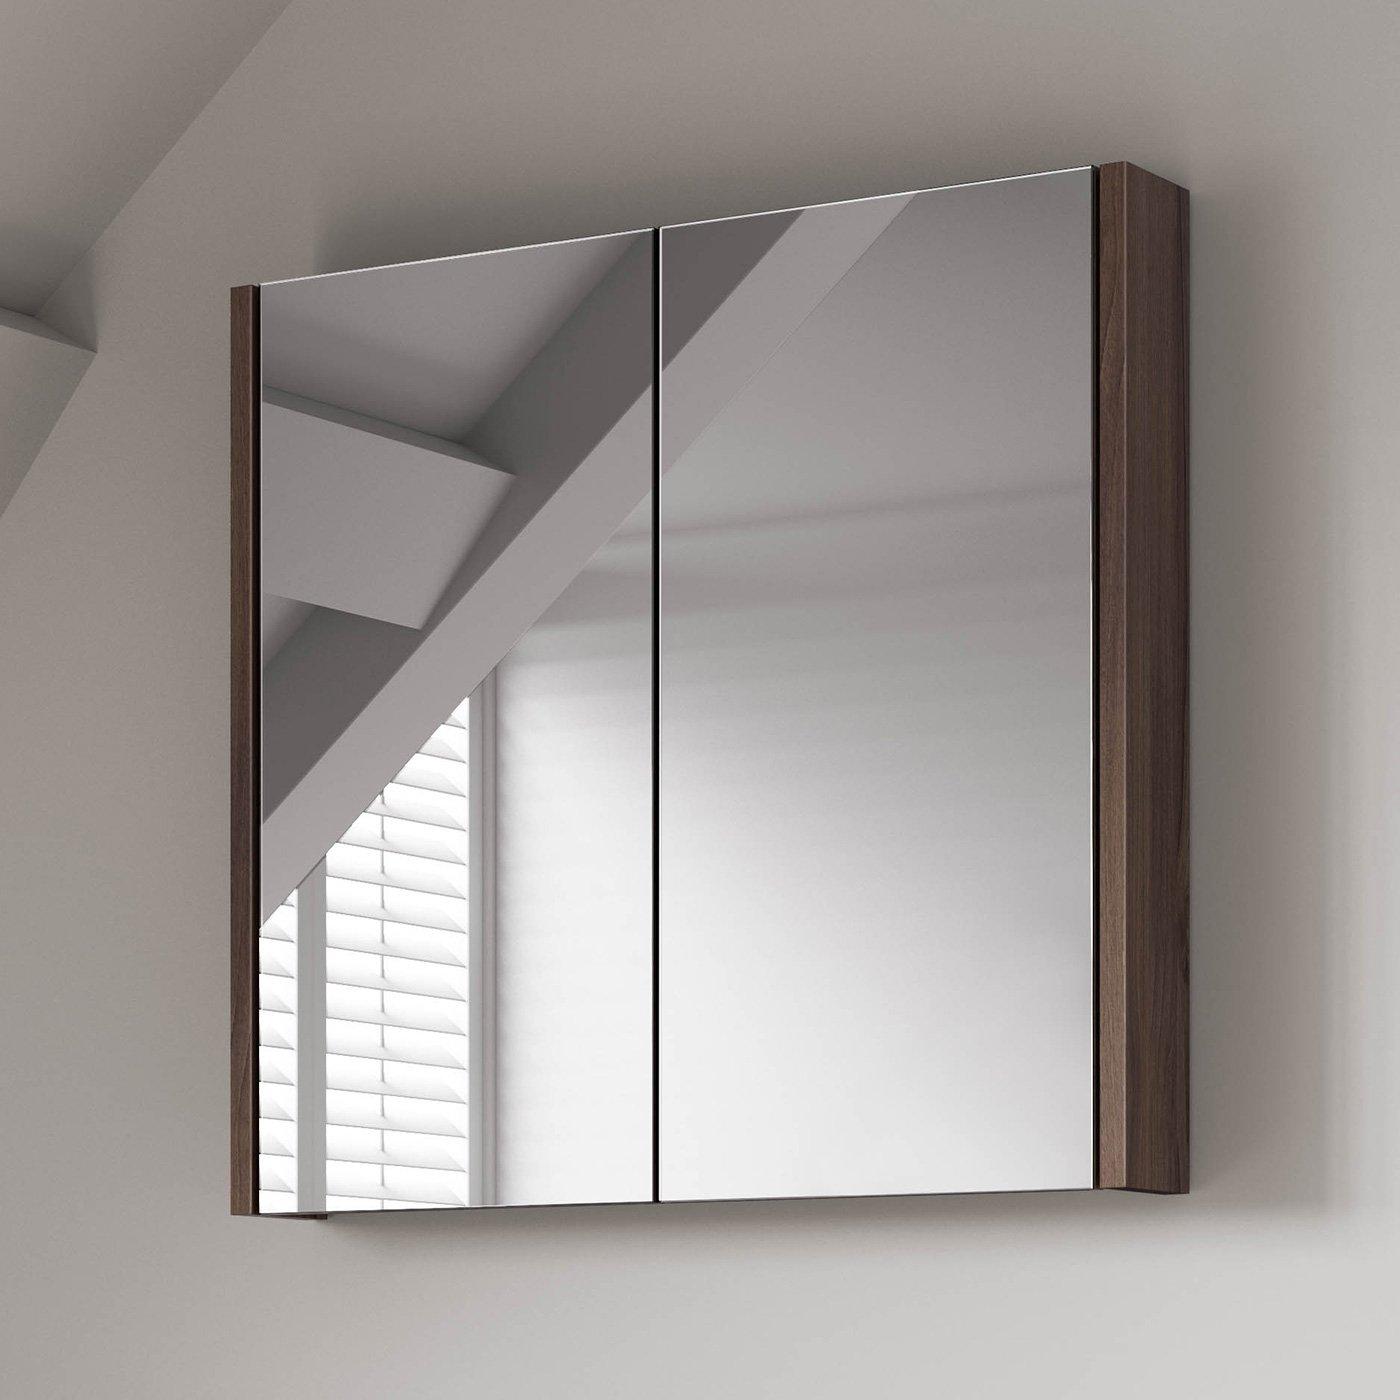 600 x 650 mm Modern Walnut Bathroom Mirror Cabinet Bathroom Furniture iBathUK